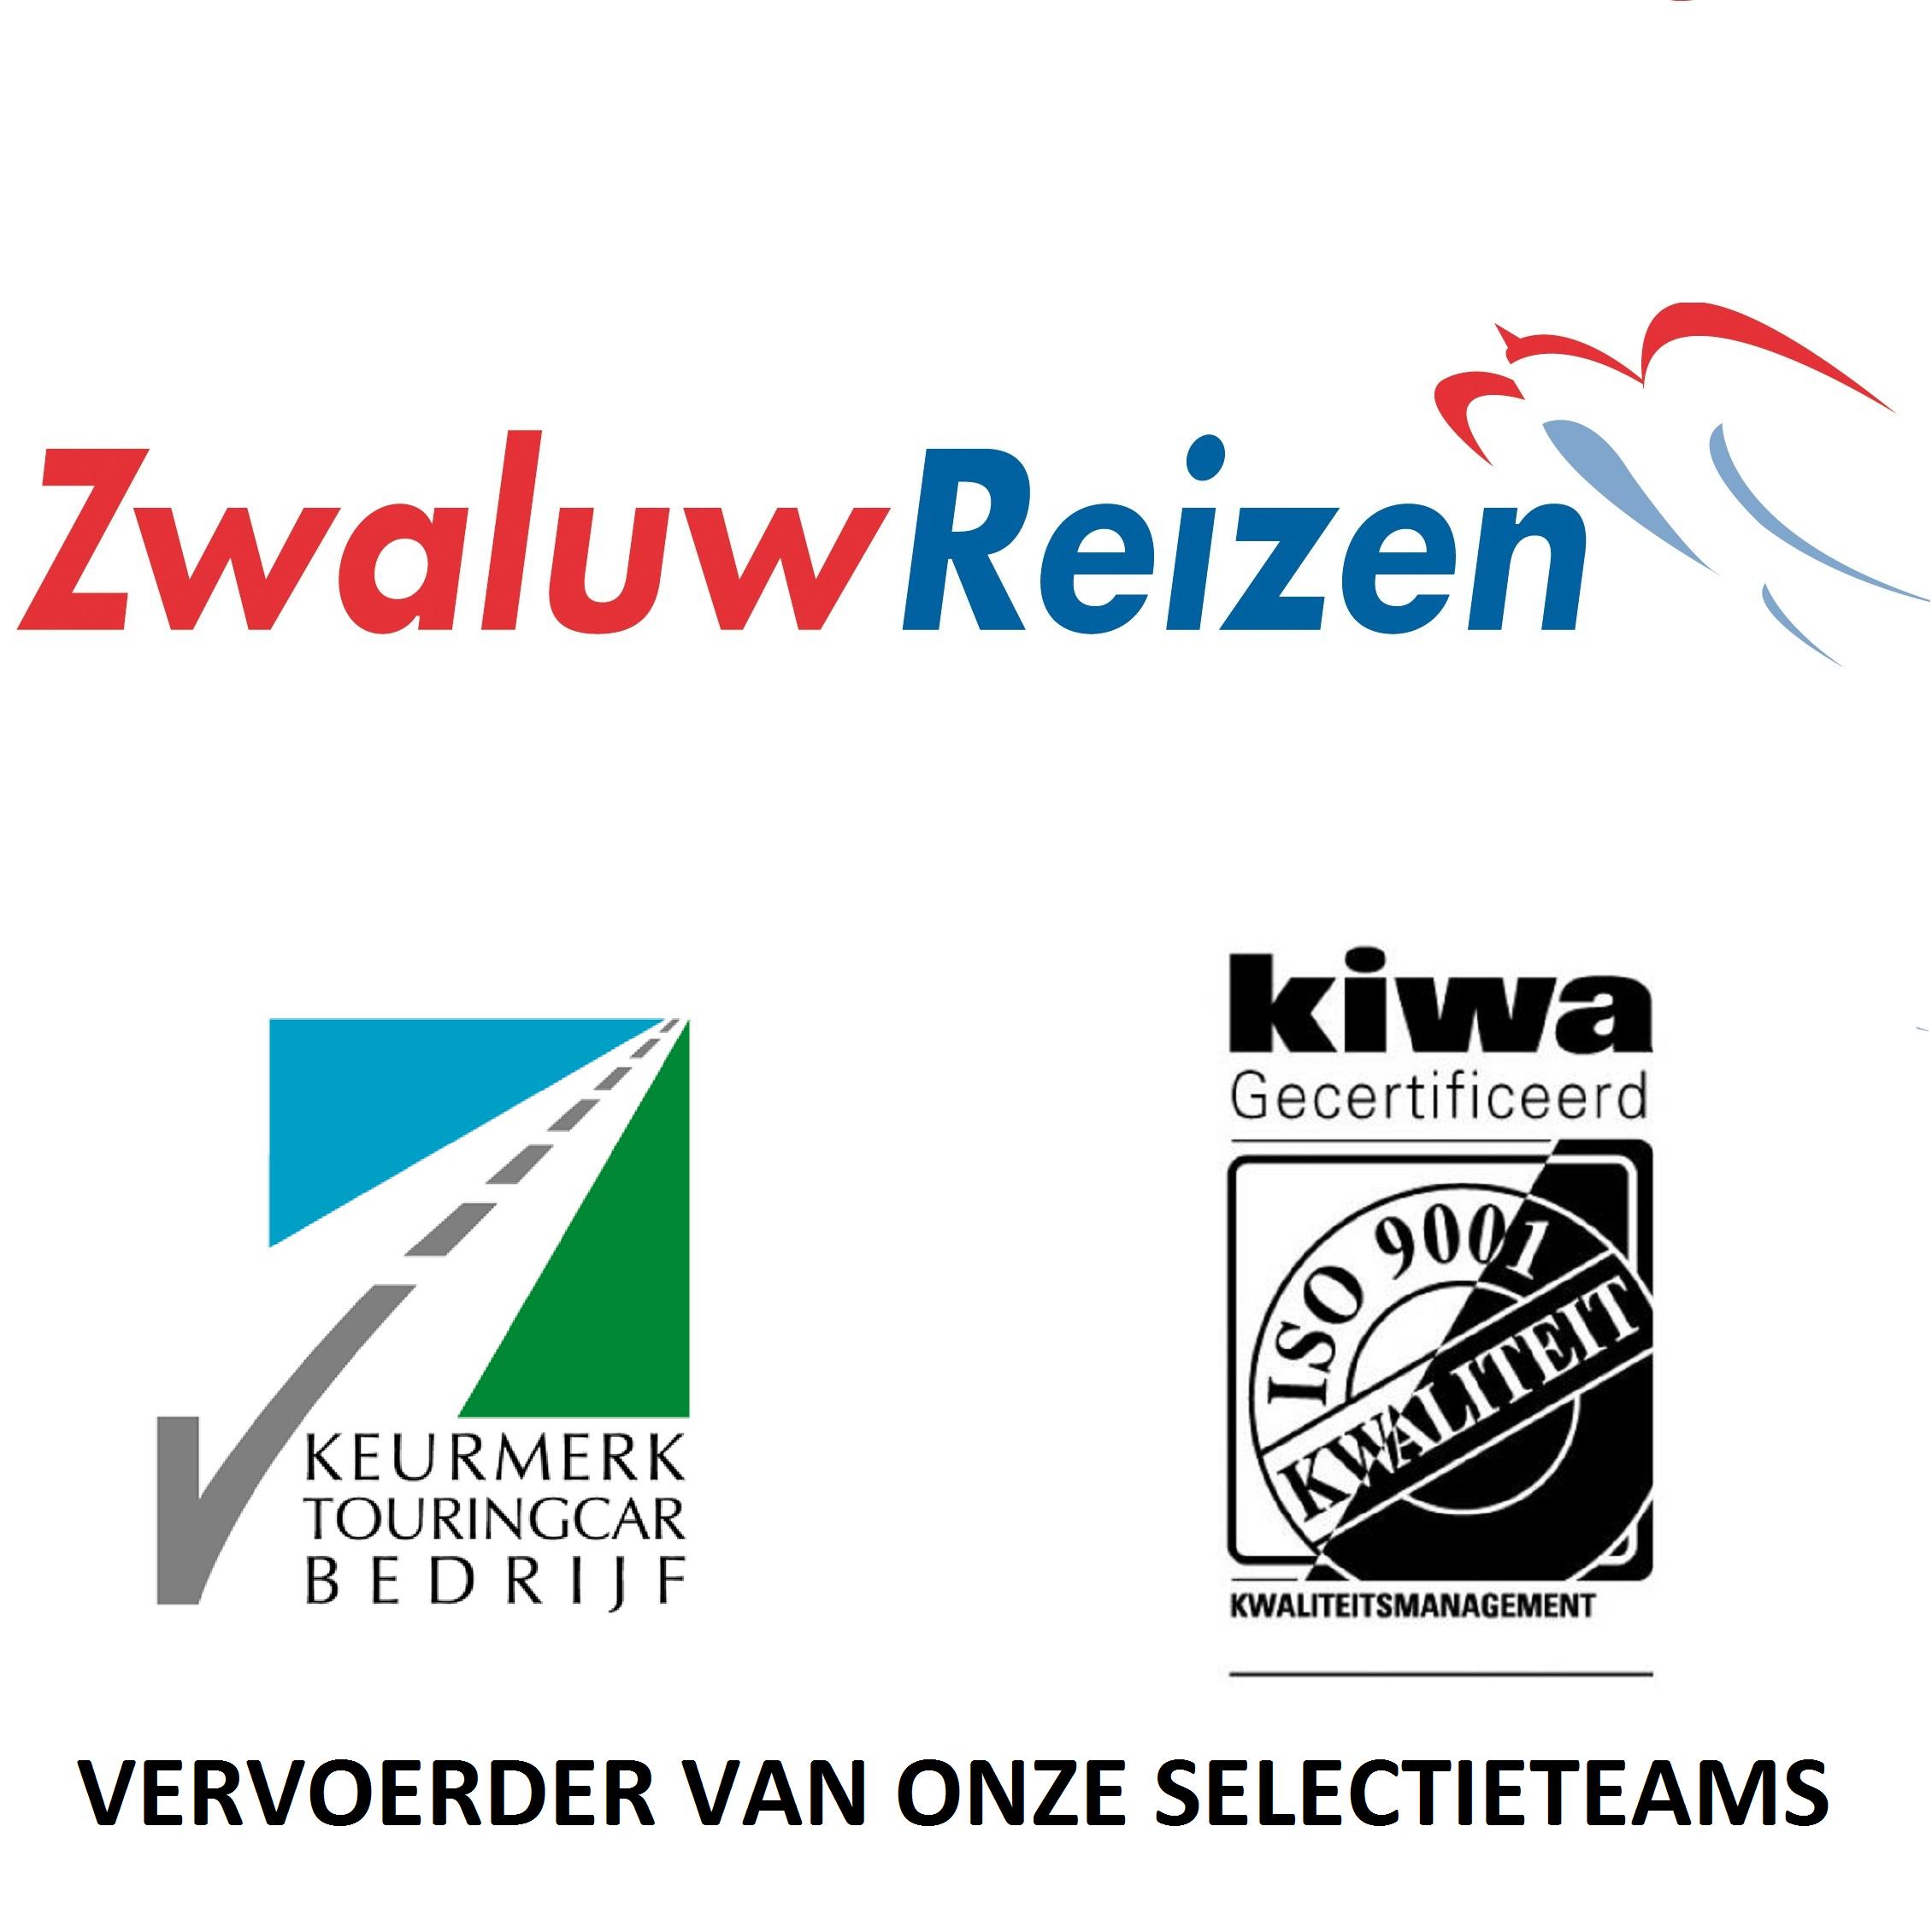 zwaluw_reizen_logo3